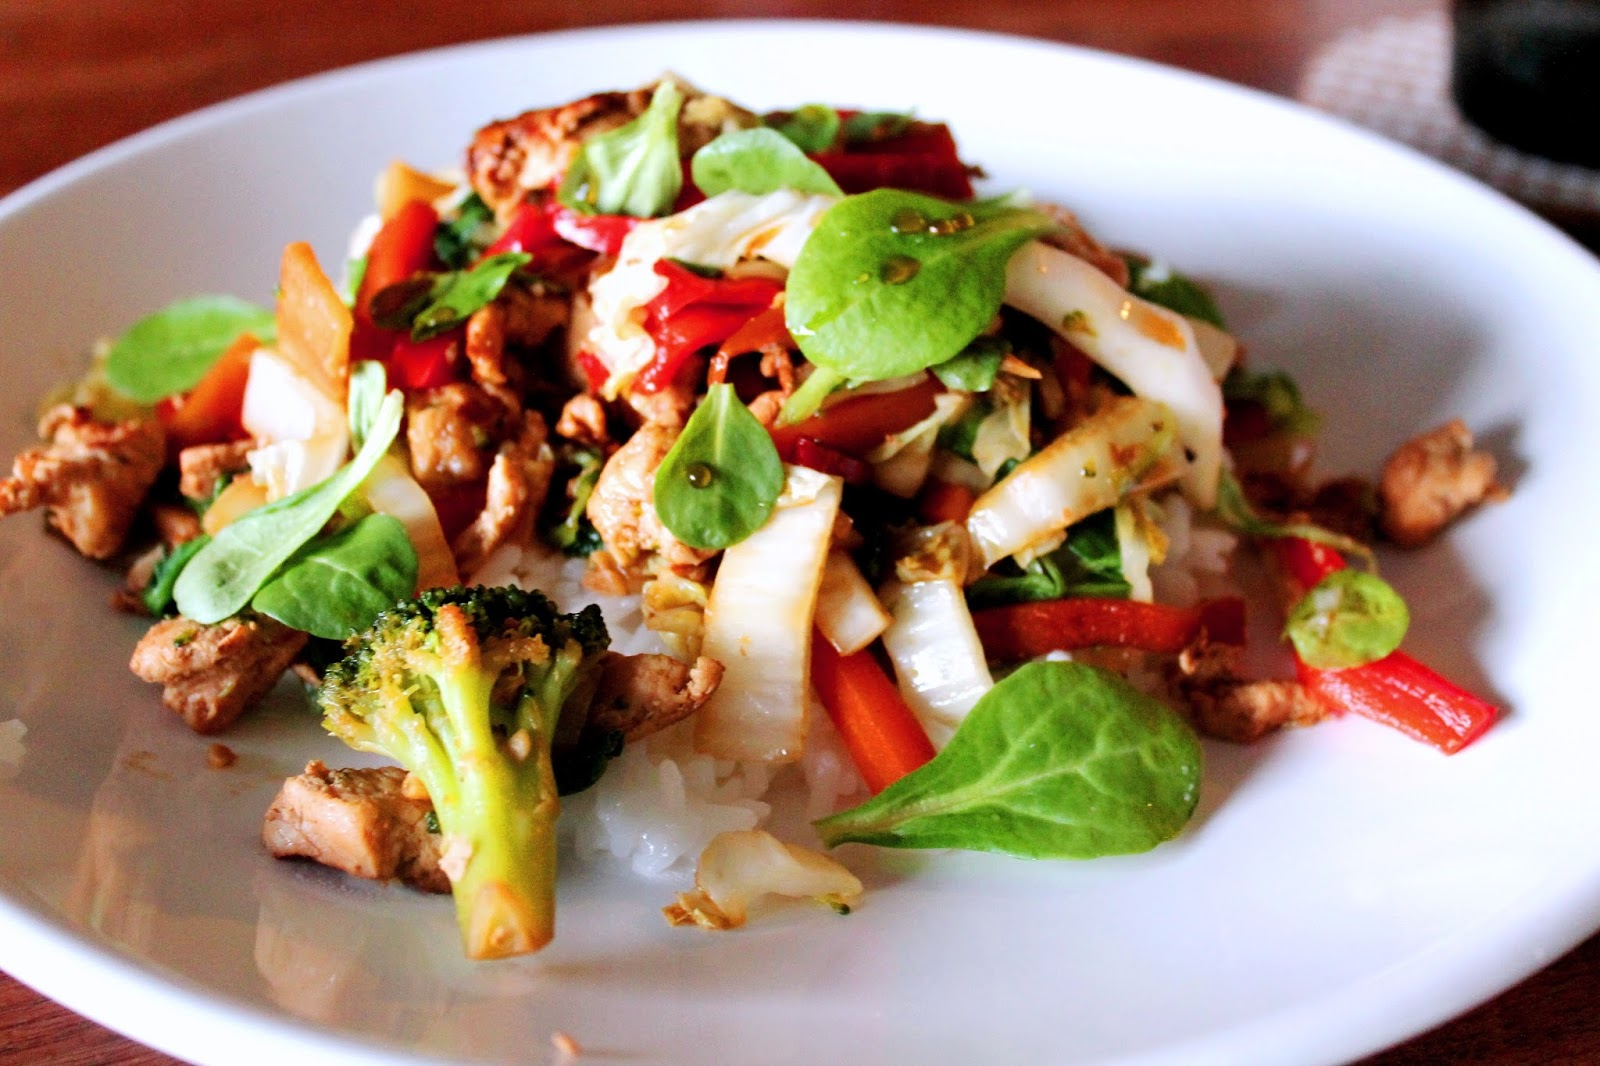 #Blogi #foodblog #foodblogger #blogrecipe #foodrecipe #parsakaali #vuonankaali #kiinankaali #verso #bambu #ruokaresepti